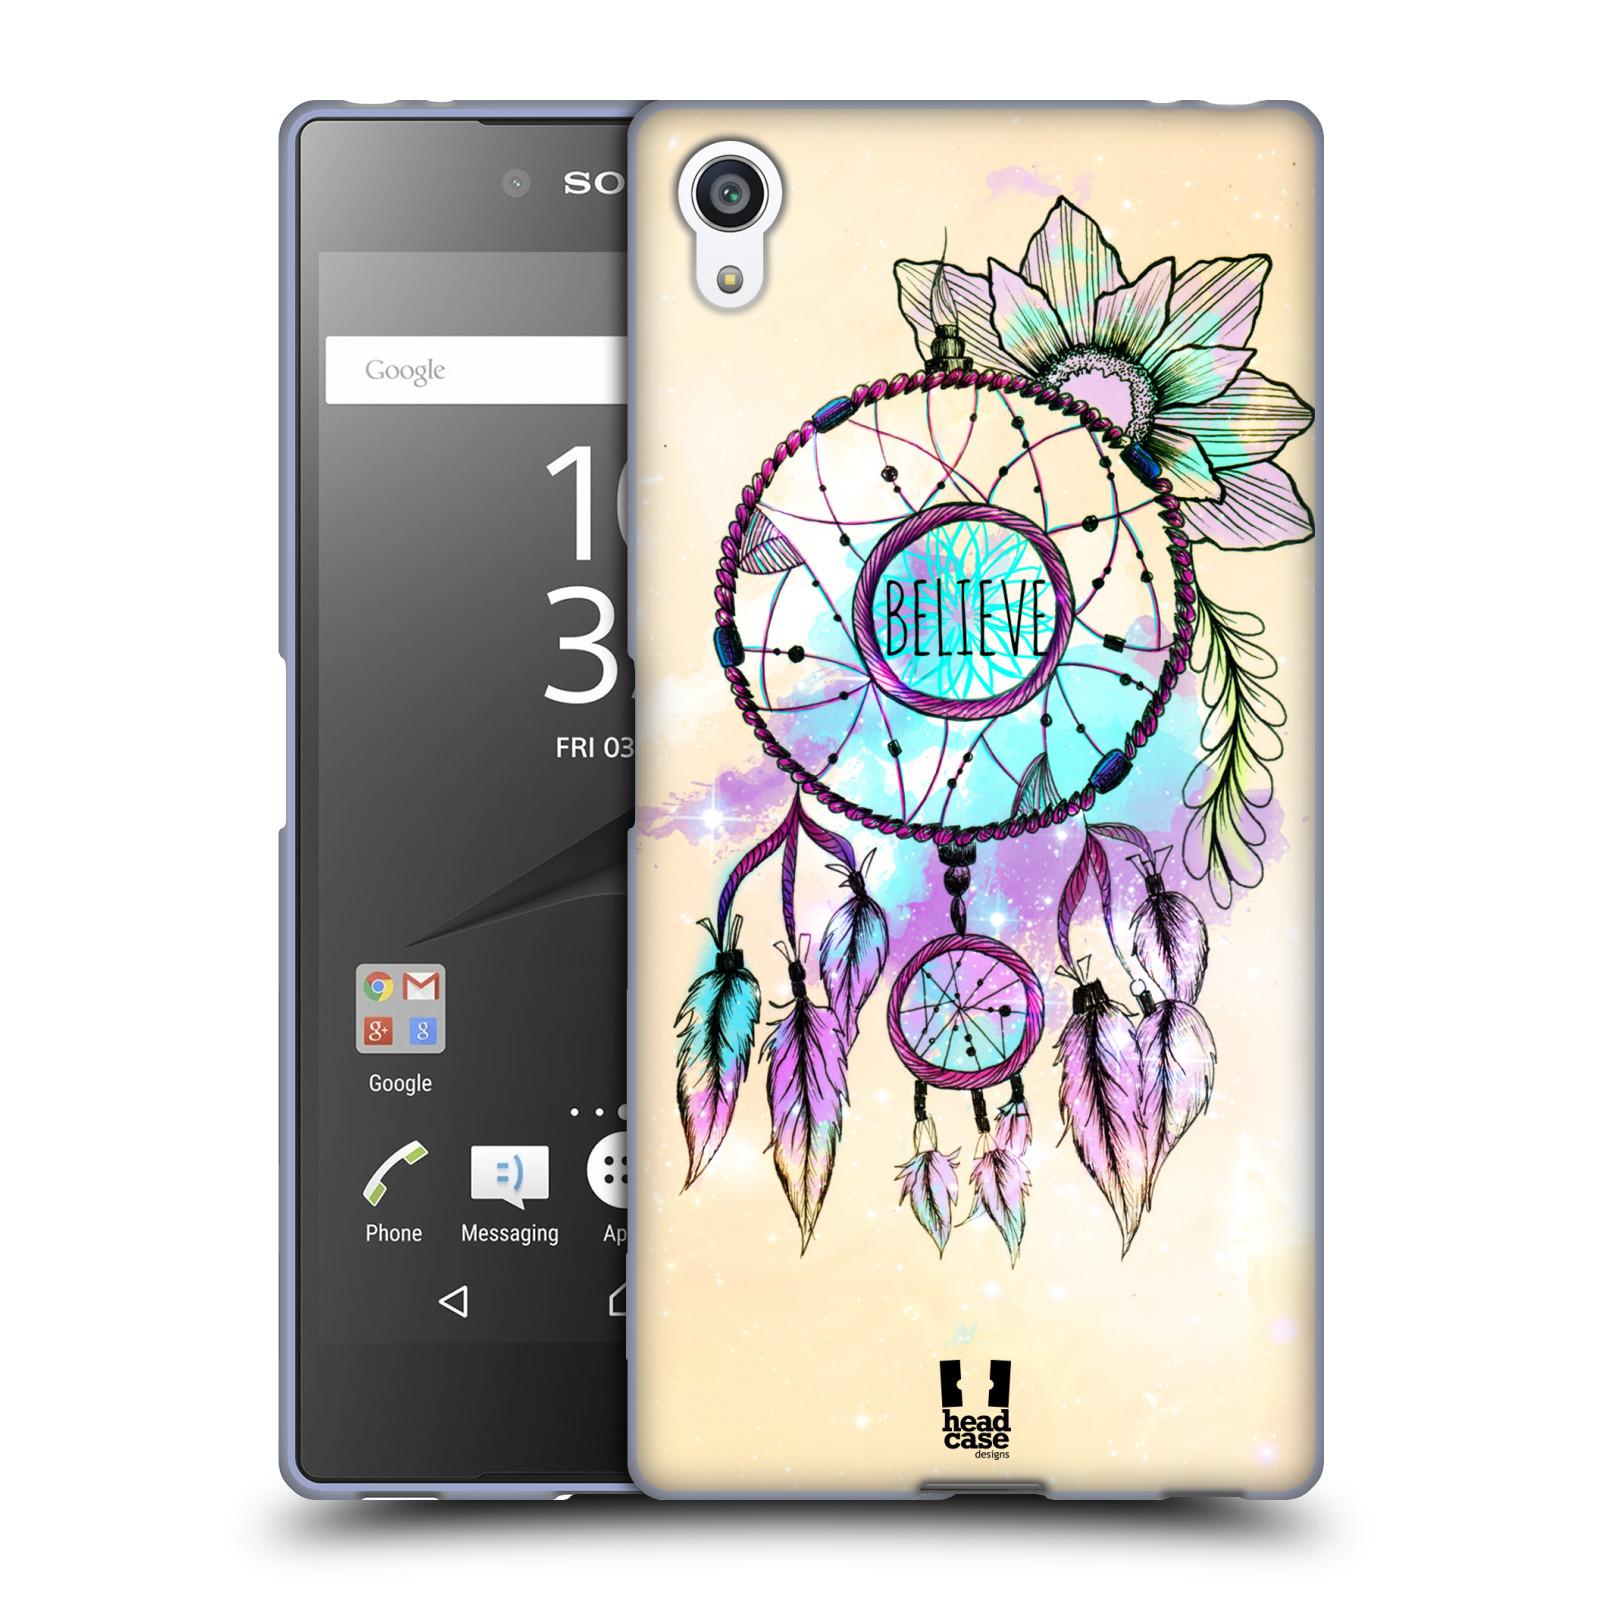 Silikonové pouzdro na mobil Sony Xperia Z5 Premium HEAD CASE MIX BELIEVE